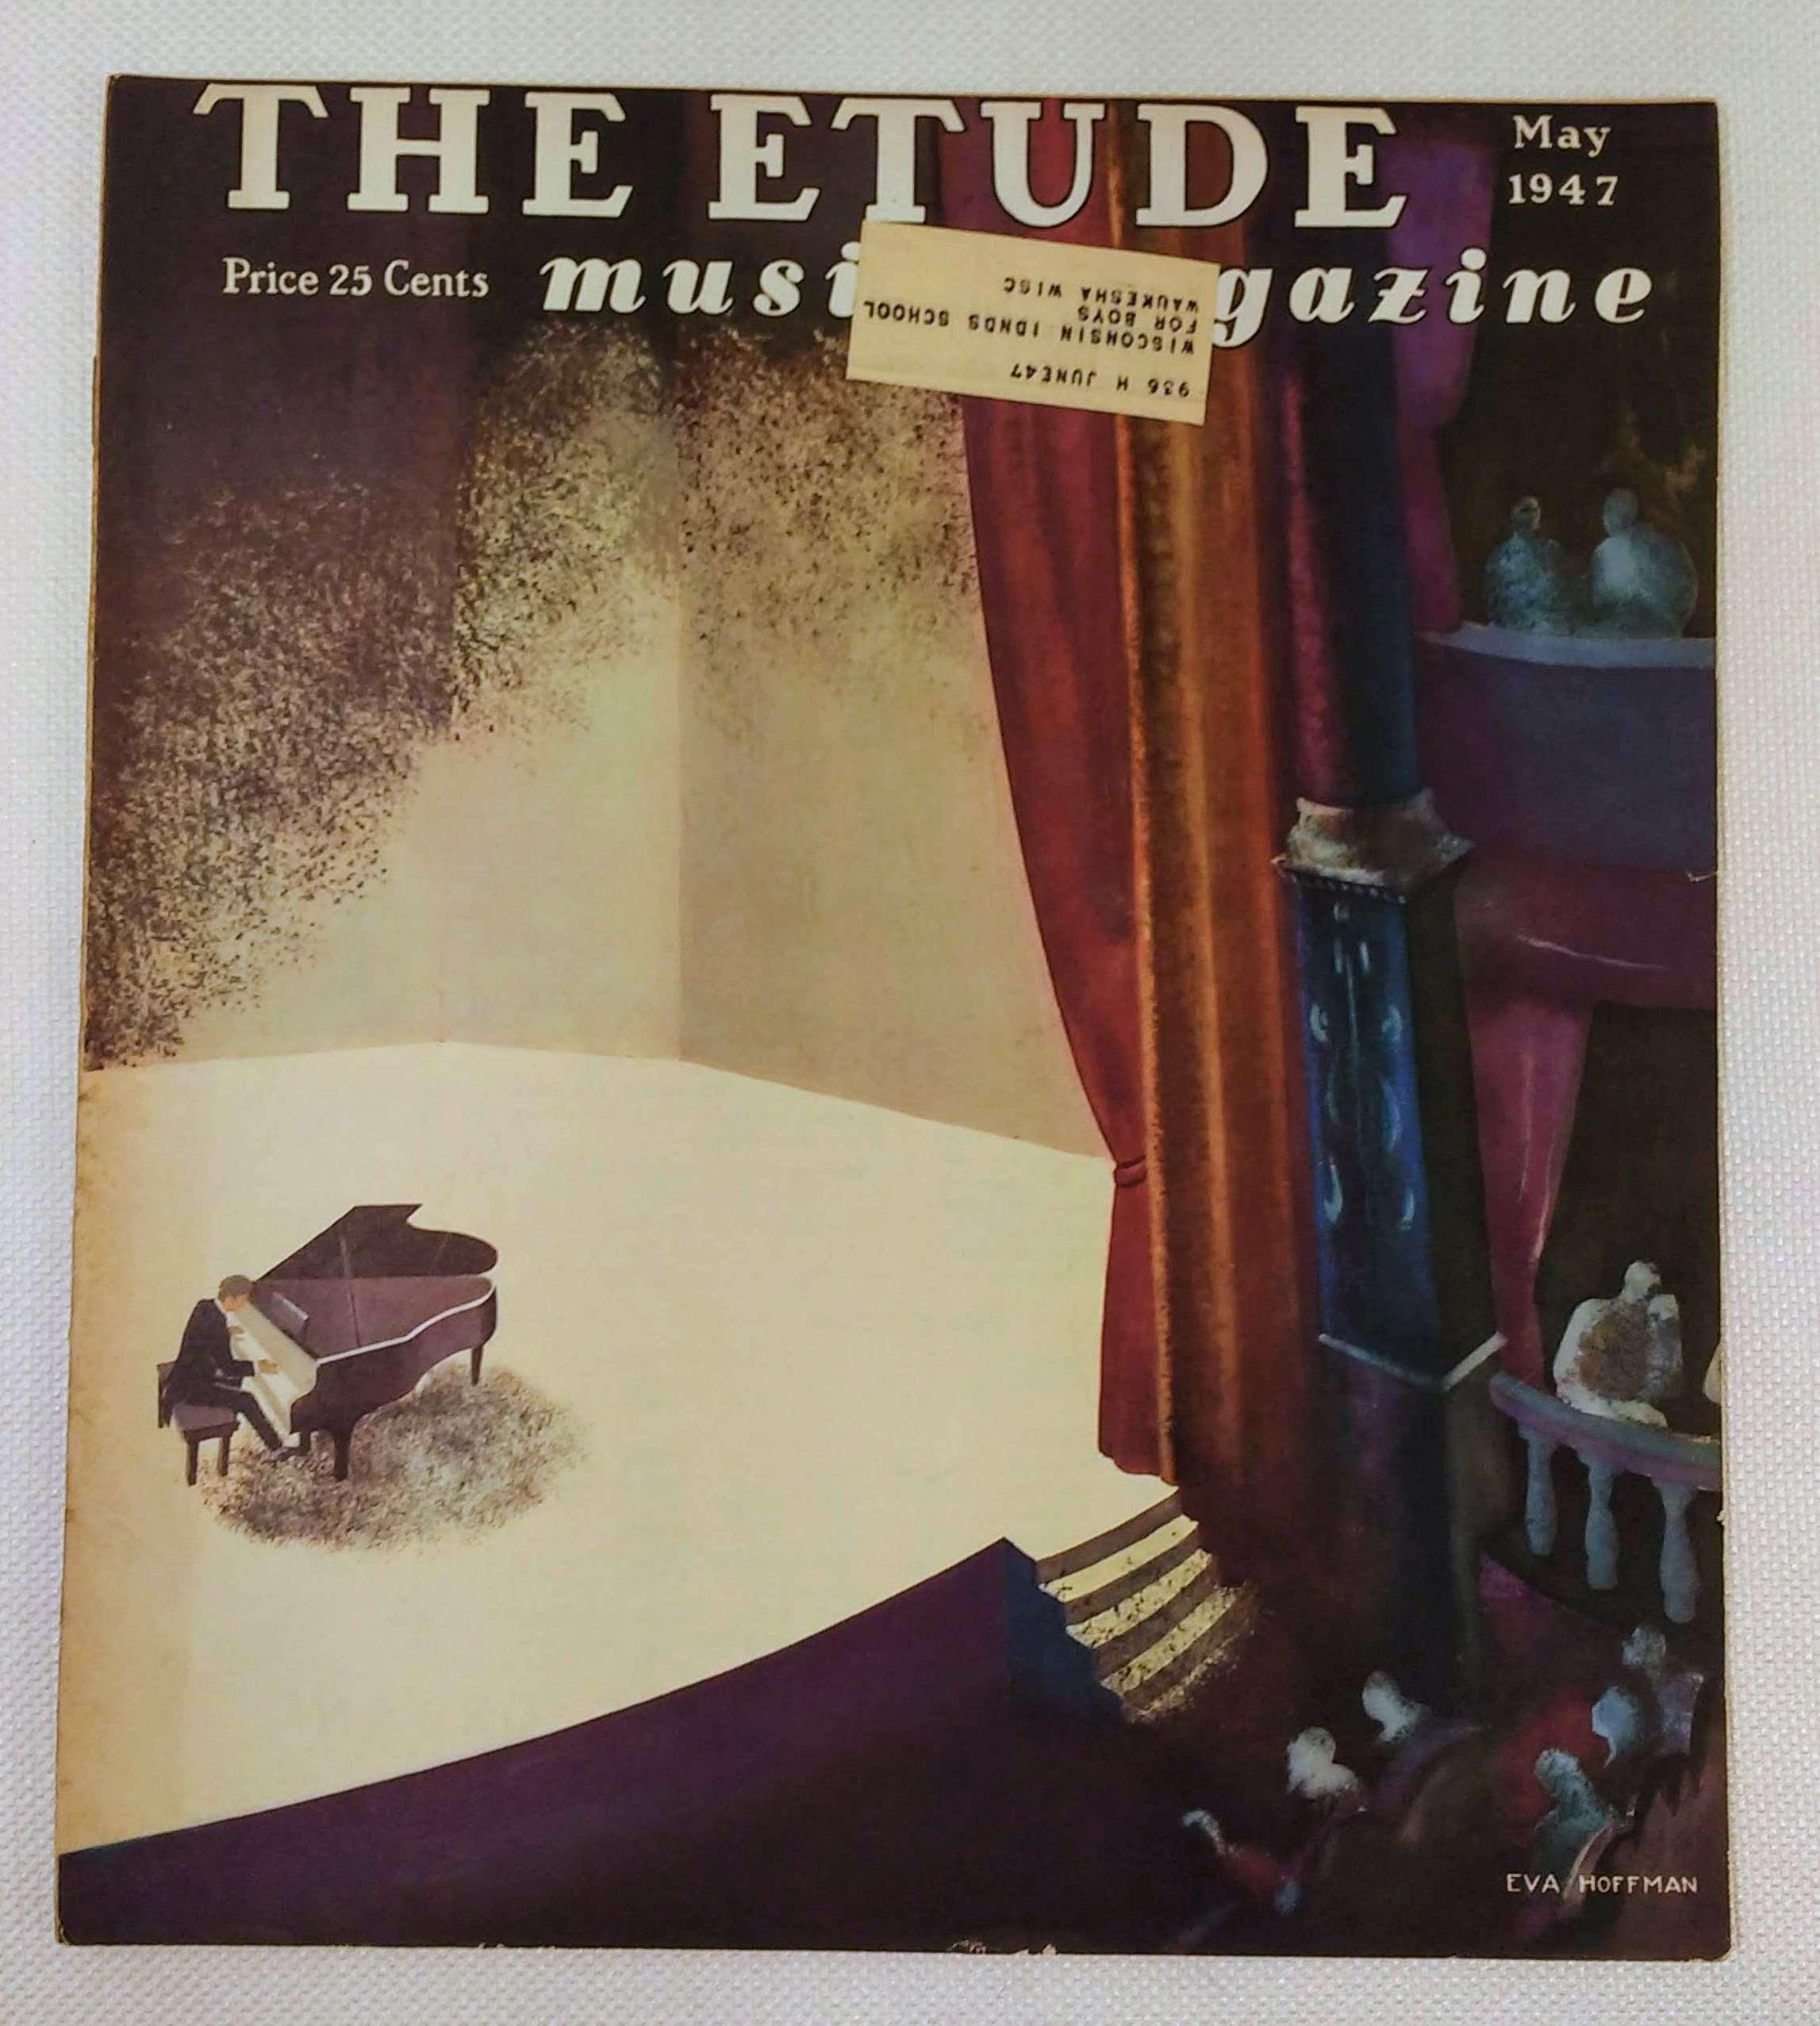 The Etude Music Magazine: Volume LXV, No. 5; May, 1947, Cooke, James Francis [ed.]